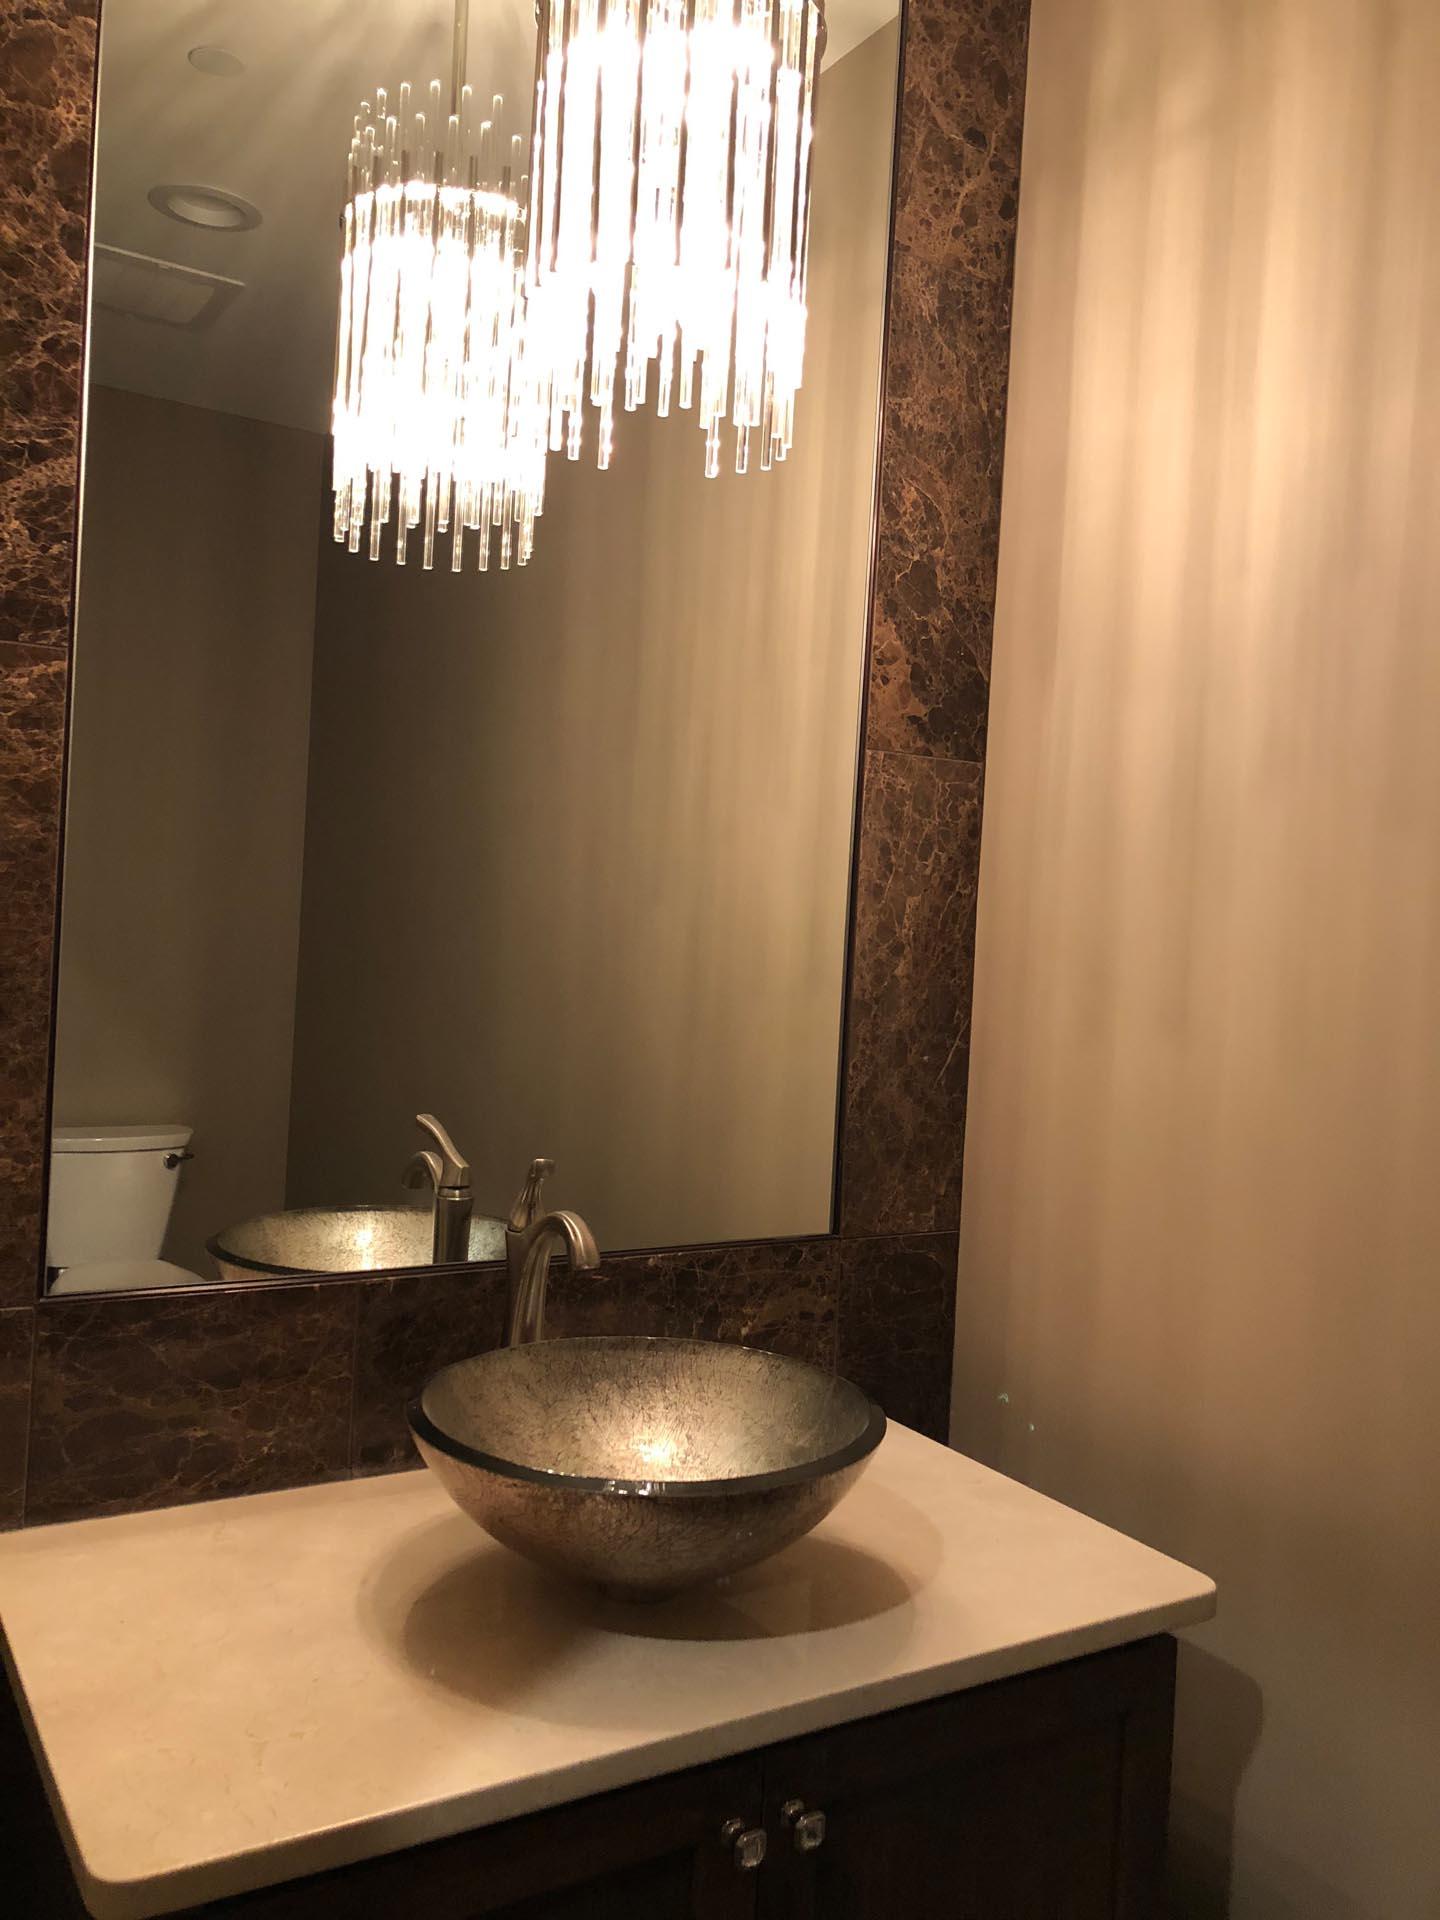 New Bathroom Sink Design | H Residence | Midland, MI